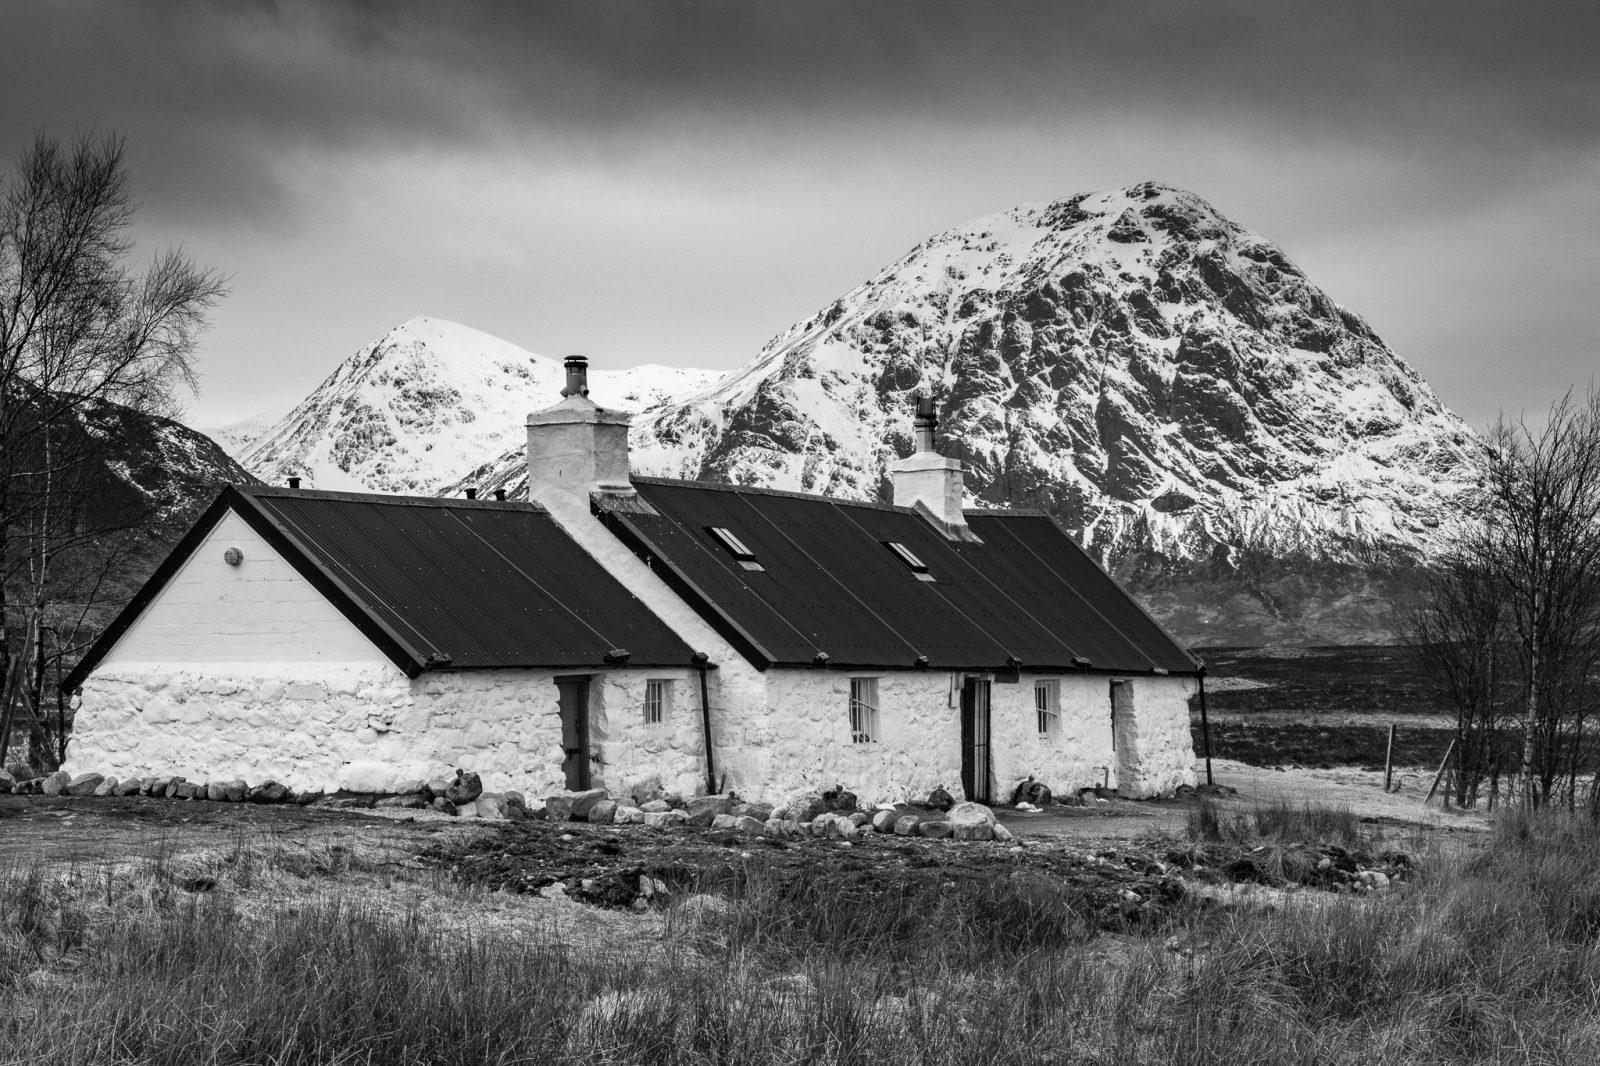 Blackrock Cottage & Buachaille Etive Mòr, Glencoe, Scotland